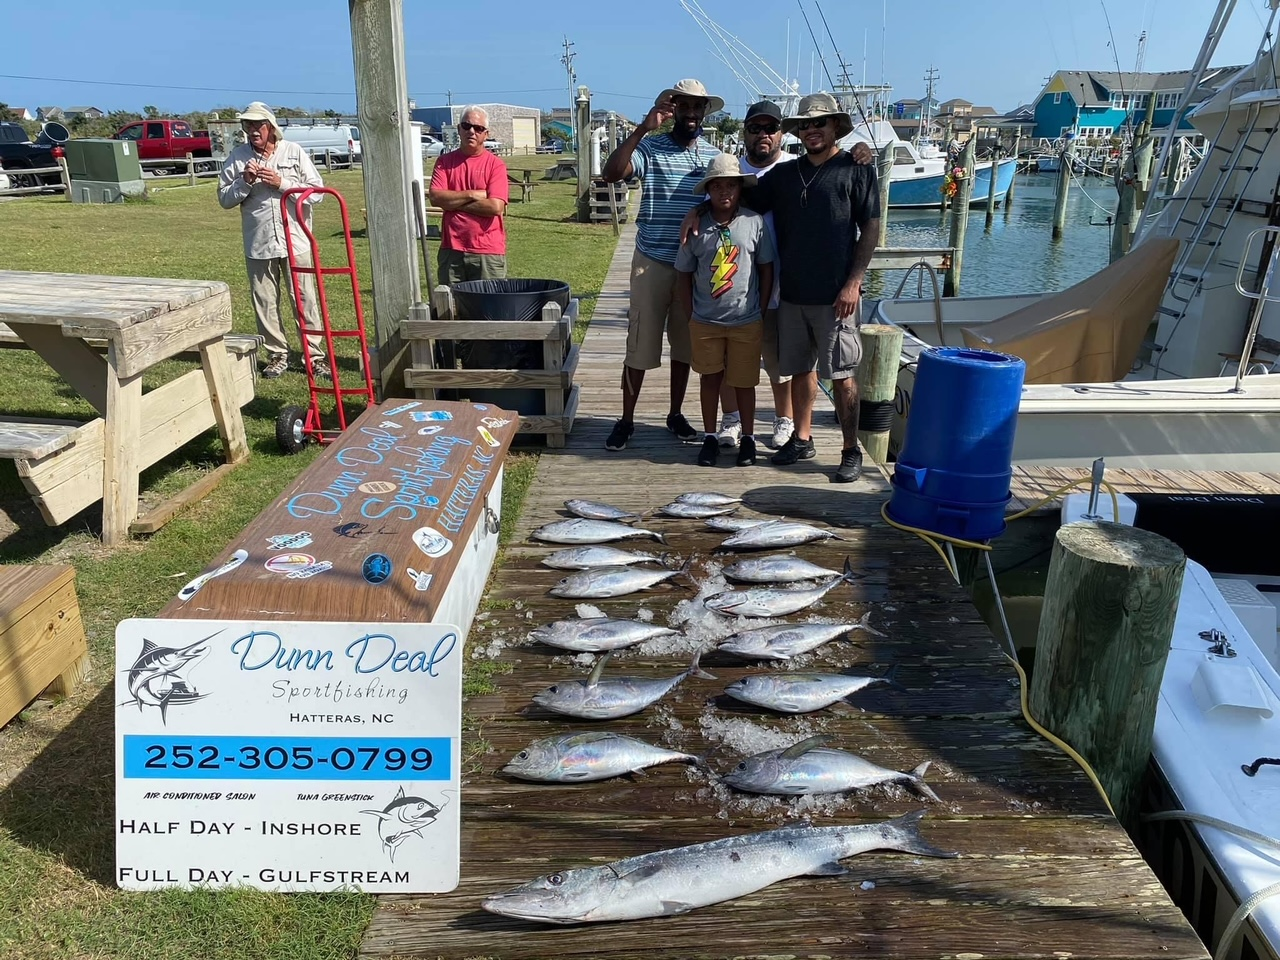 Teach's Lair Marina Offshore Fishing Dunn Deal OBX Hatteras